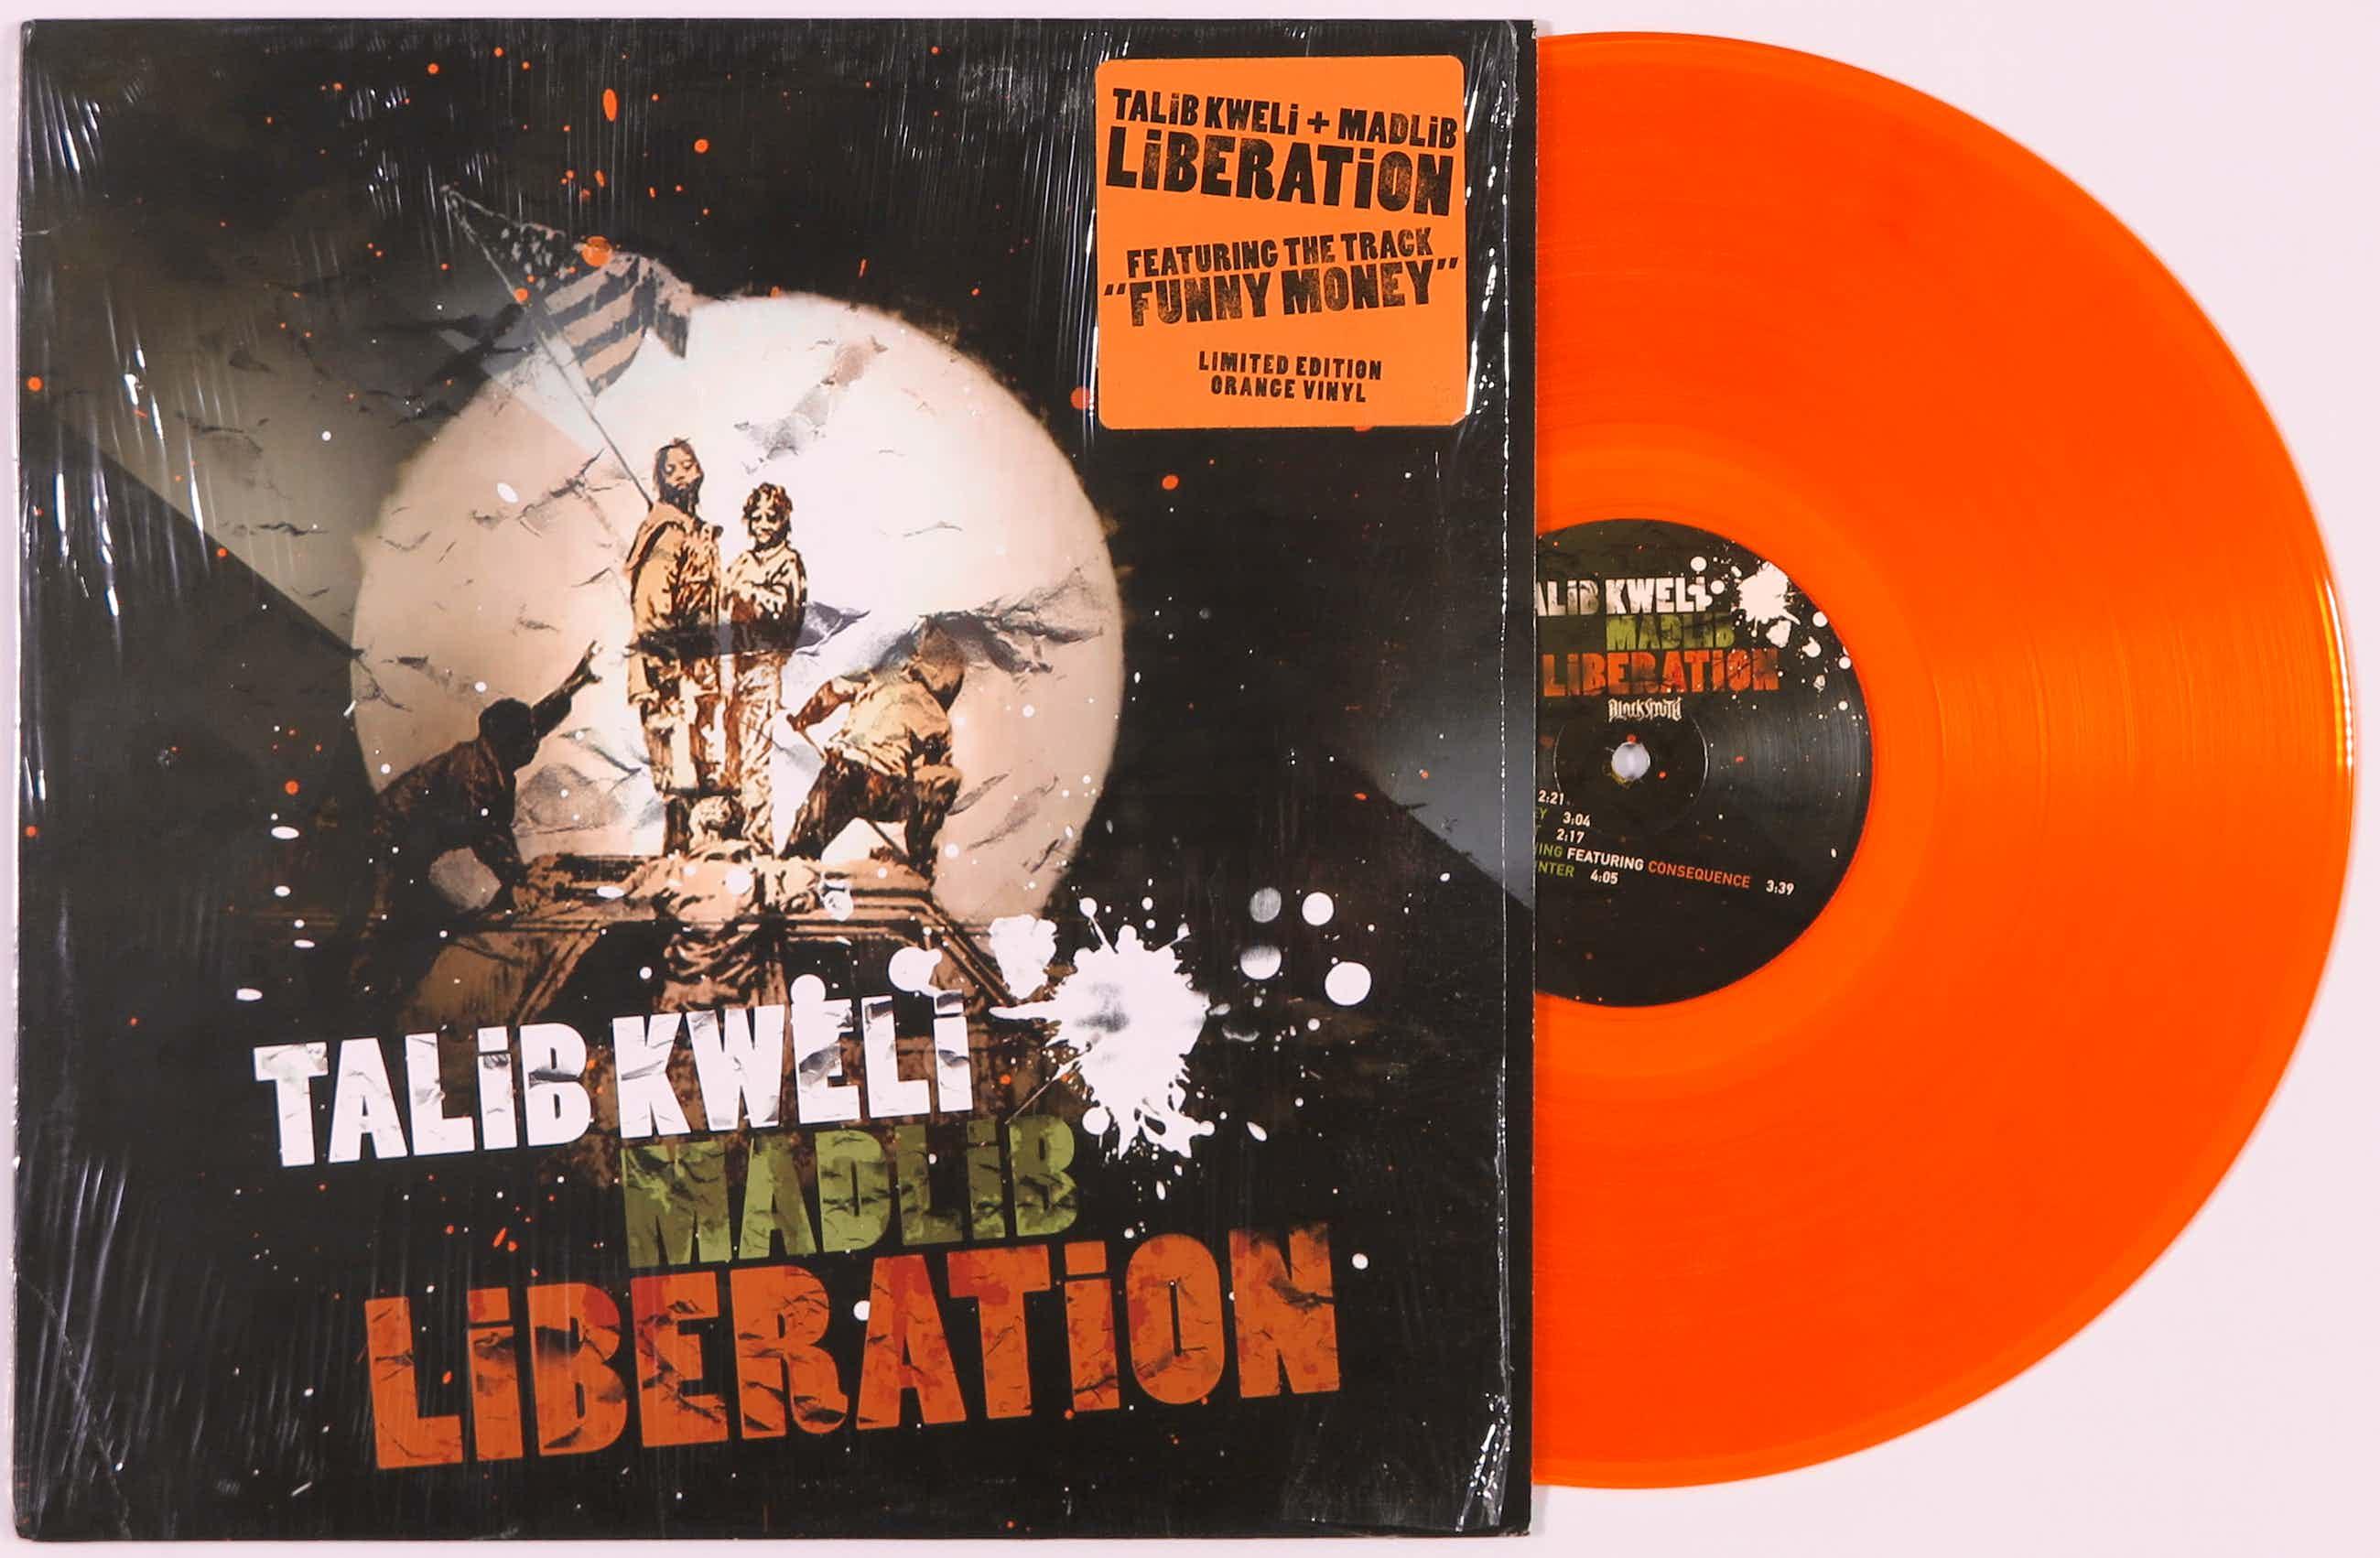 Banksy - Limited edition album Liberation van Talib Kweli & Madlib kopen? Bied vanaf 100!